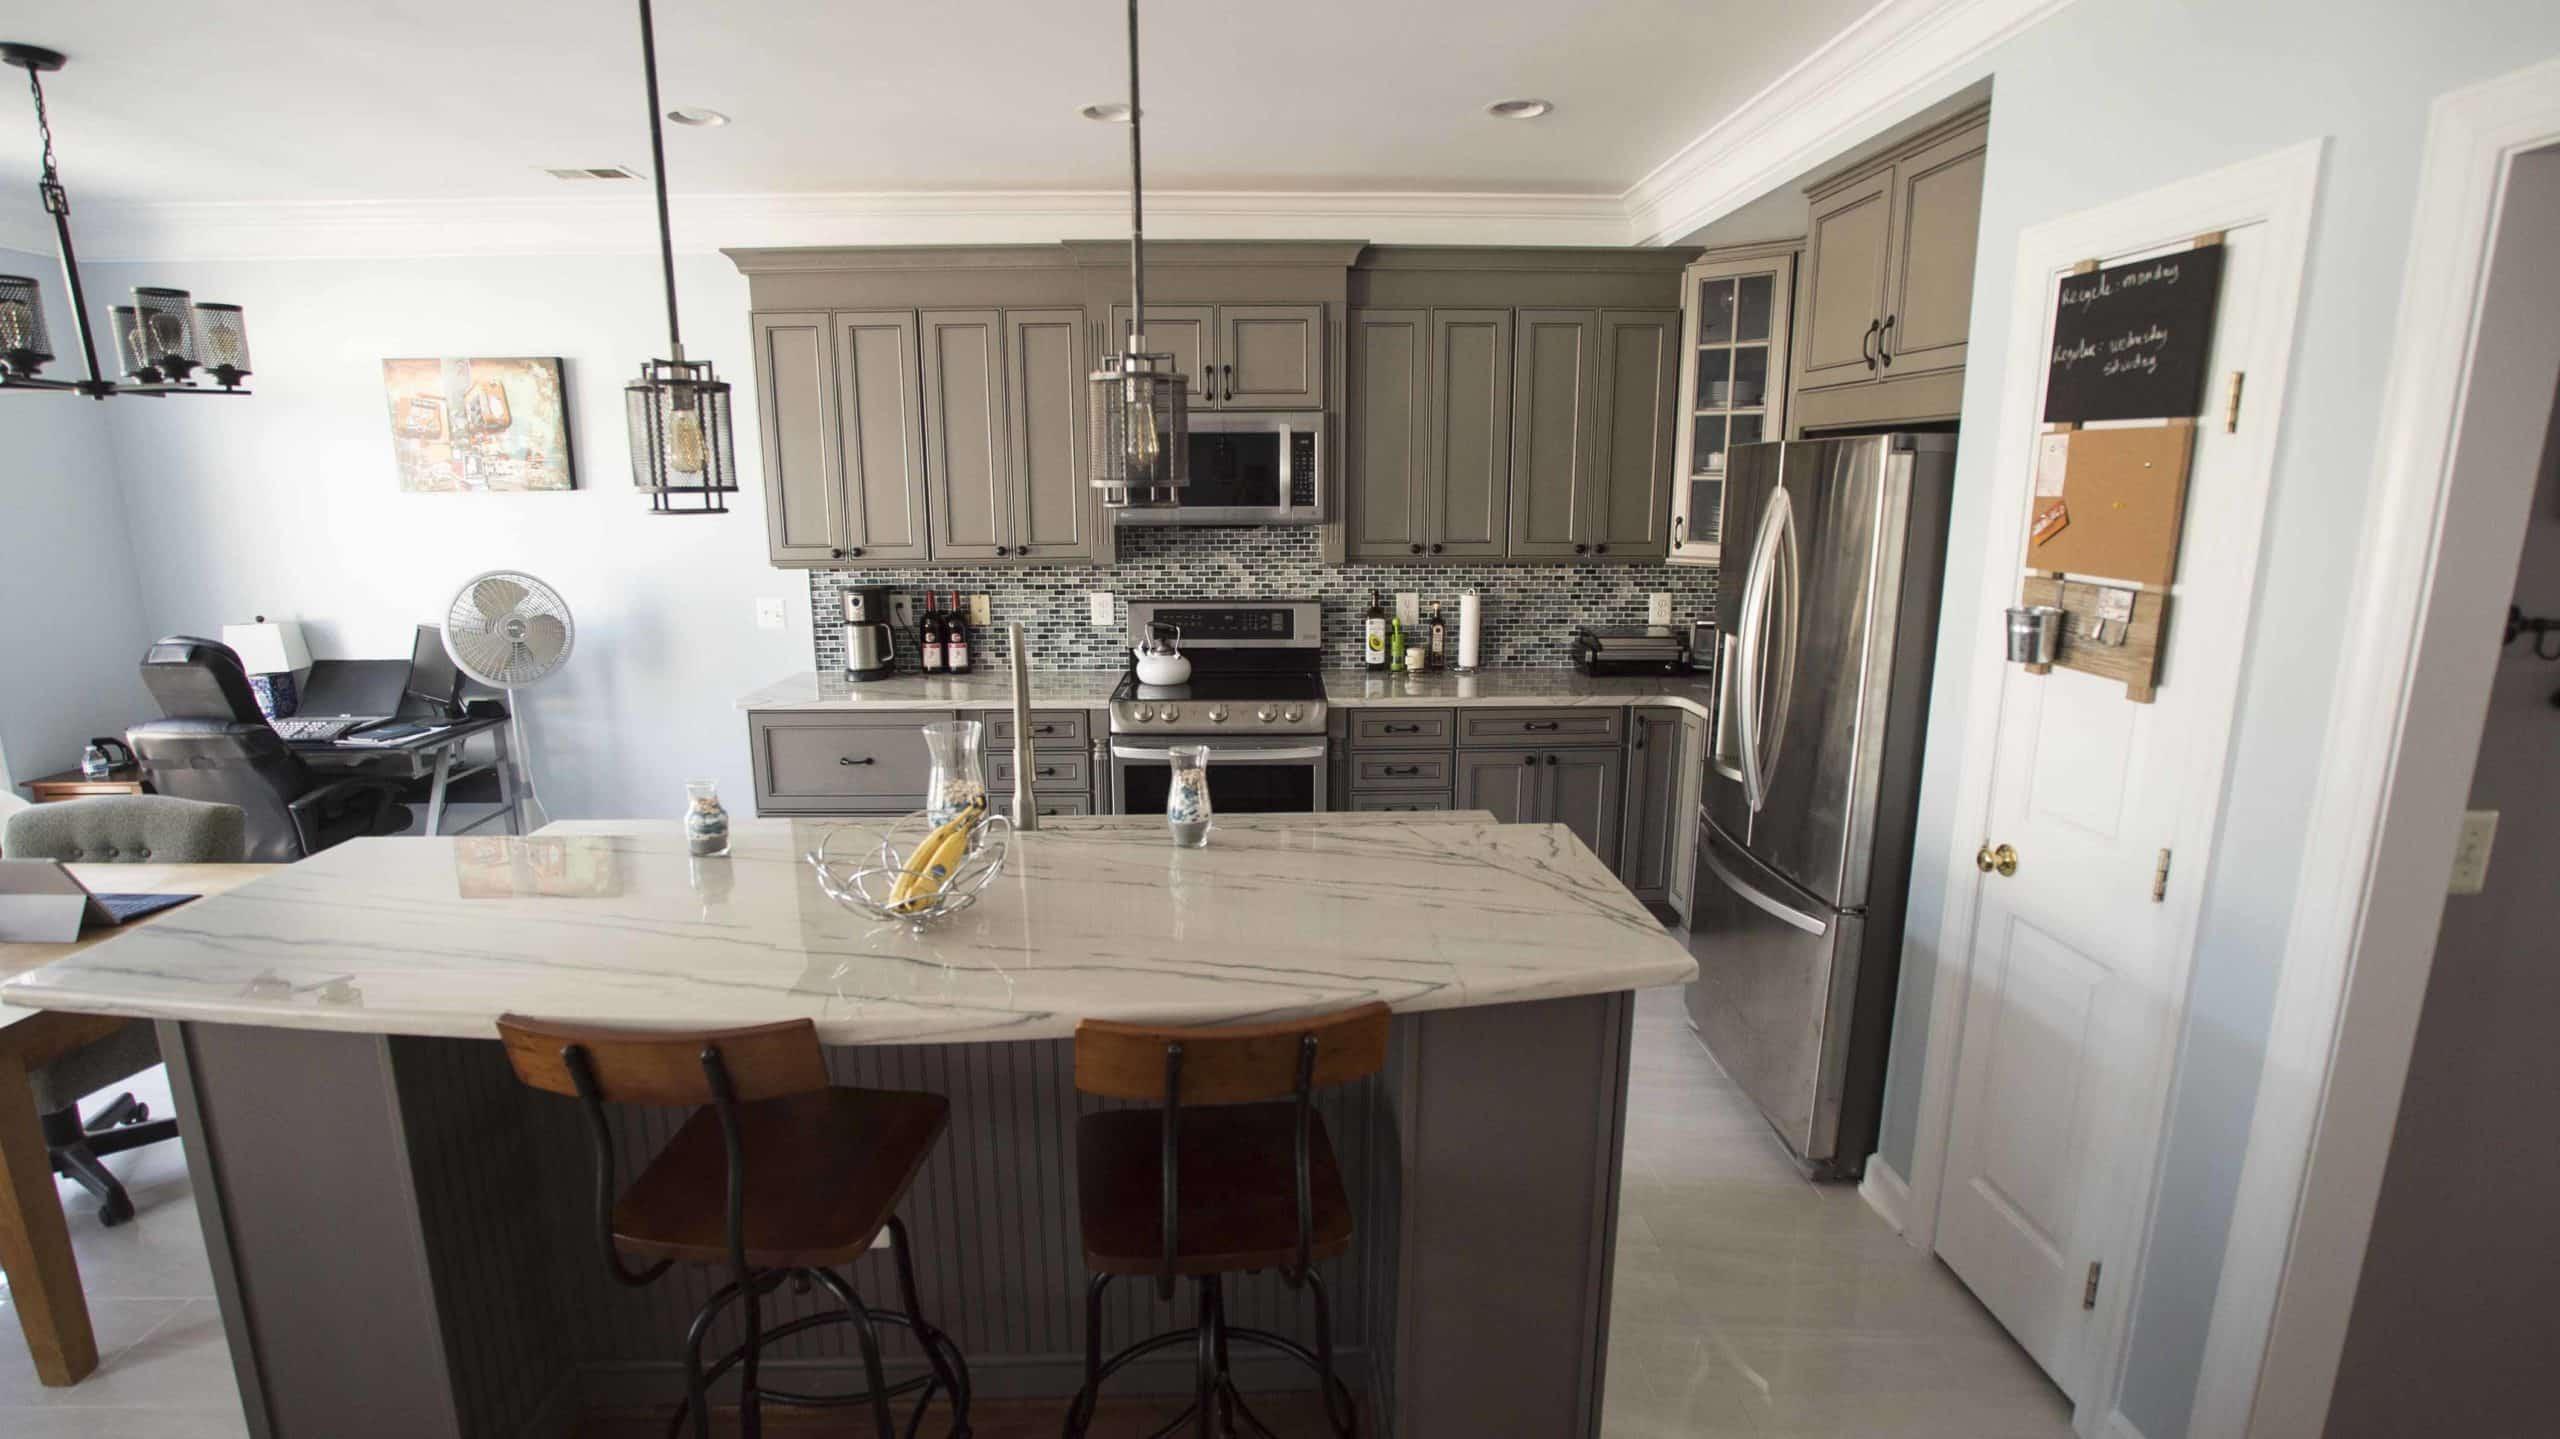 Gorgeous Kitchen Renovation In Potomac Maryland: Kitchen Remodeling Gaithersburg Md